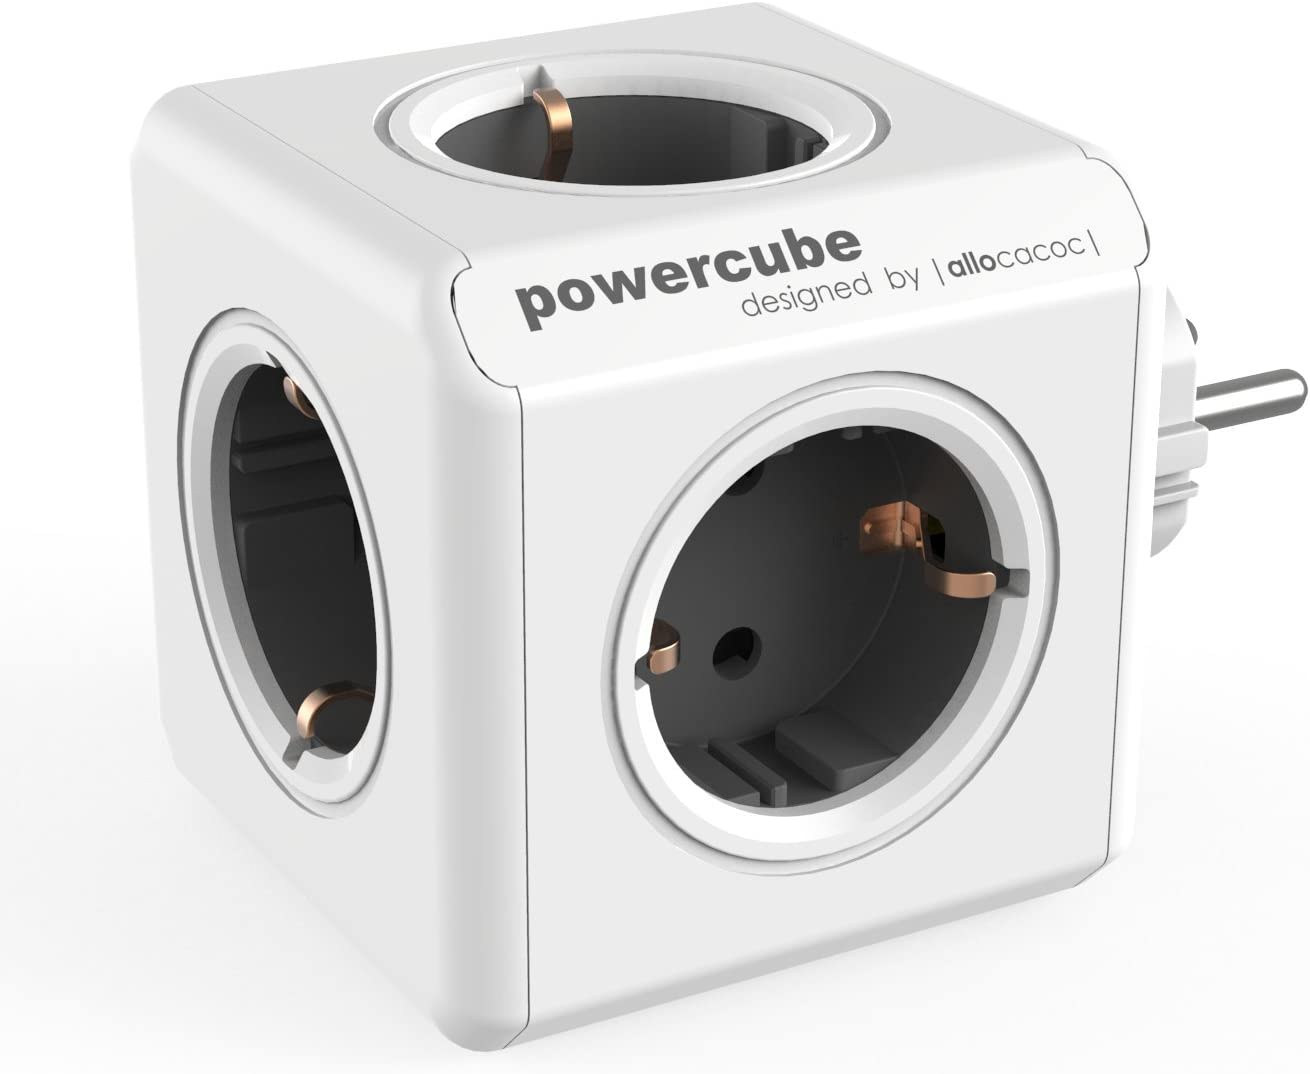 Allocacoc 1100GY/DEORPC PowerCube Original - Regleta de 5 tomas de corriente, Color Gris, 250 V, Oscuro